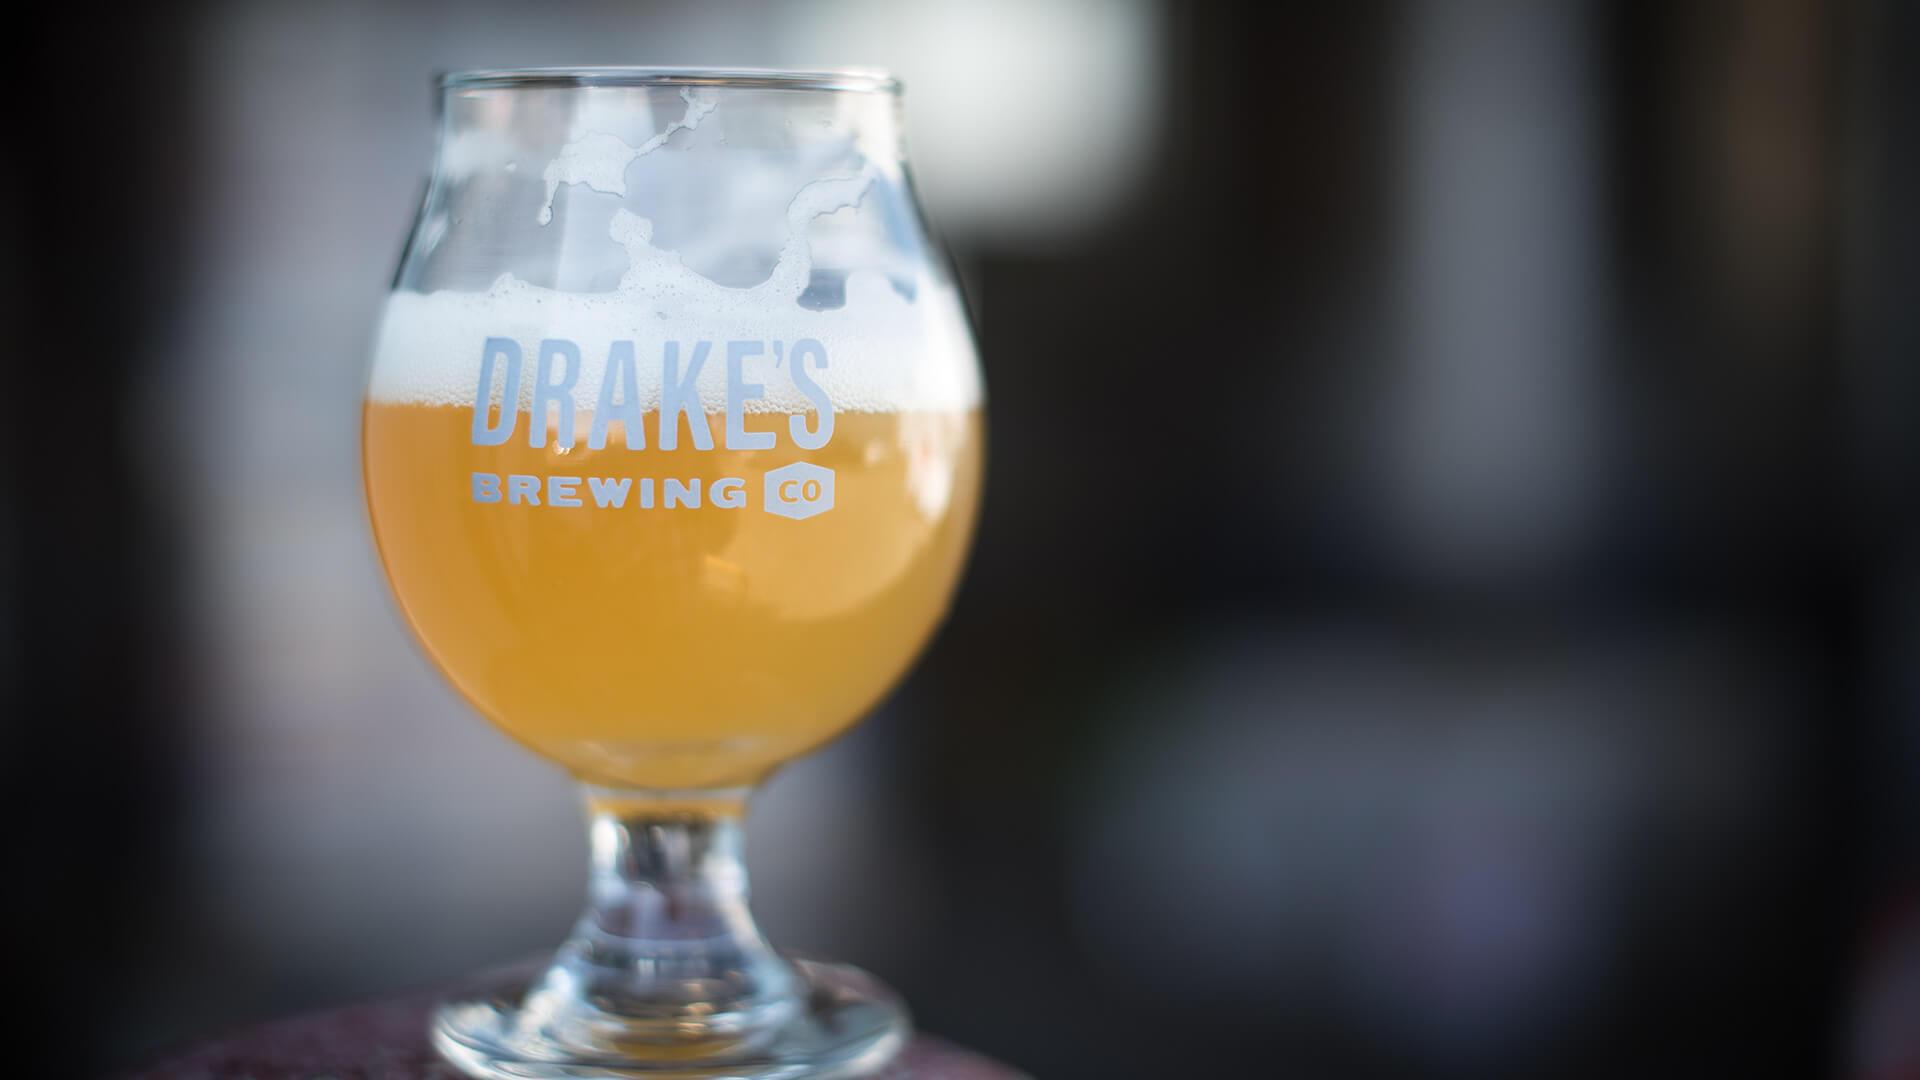 Drake's Brewing — Trocken